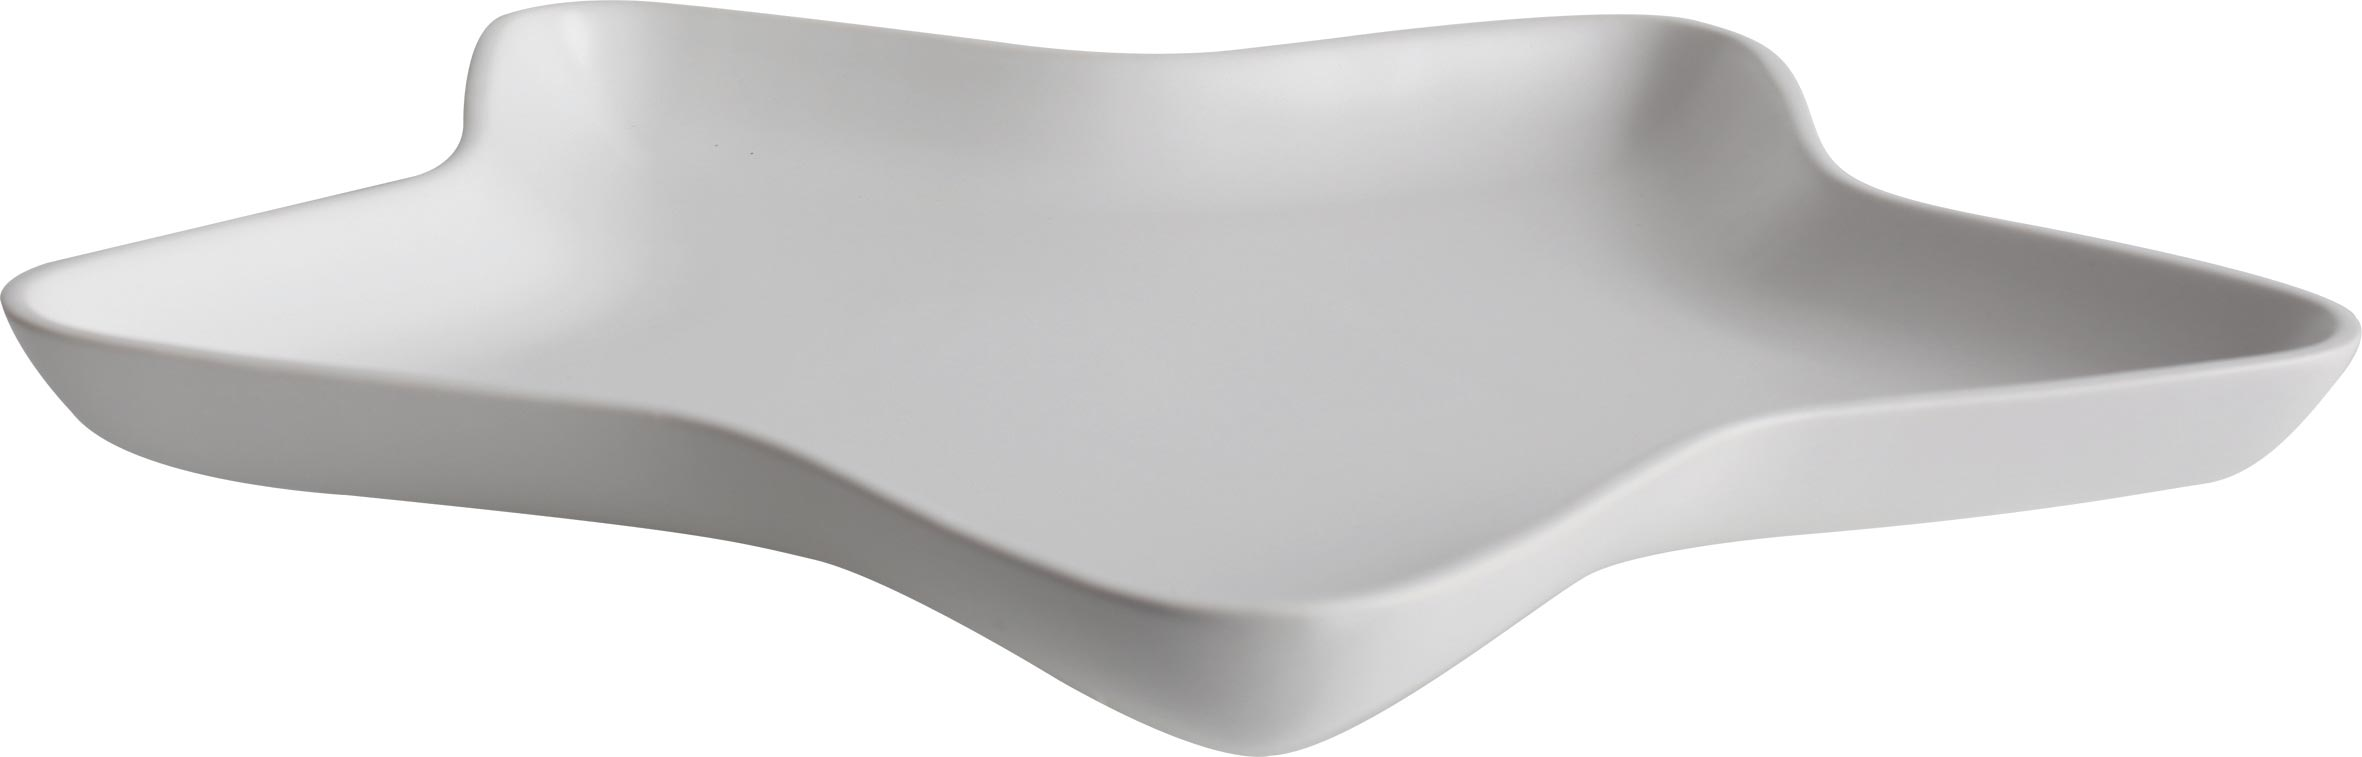 sternschale wei schalen vasen bert pfe produkte. Black Bedroom Furniture Sets. Home Design Ideas